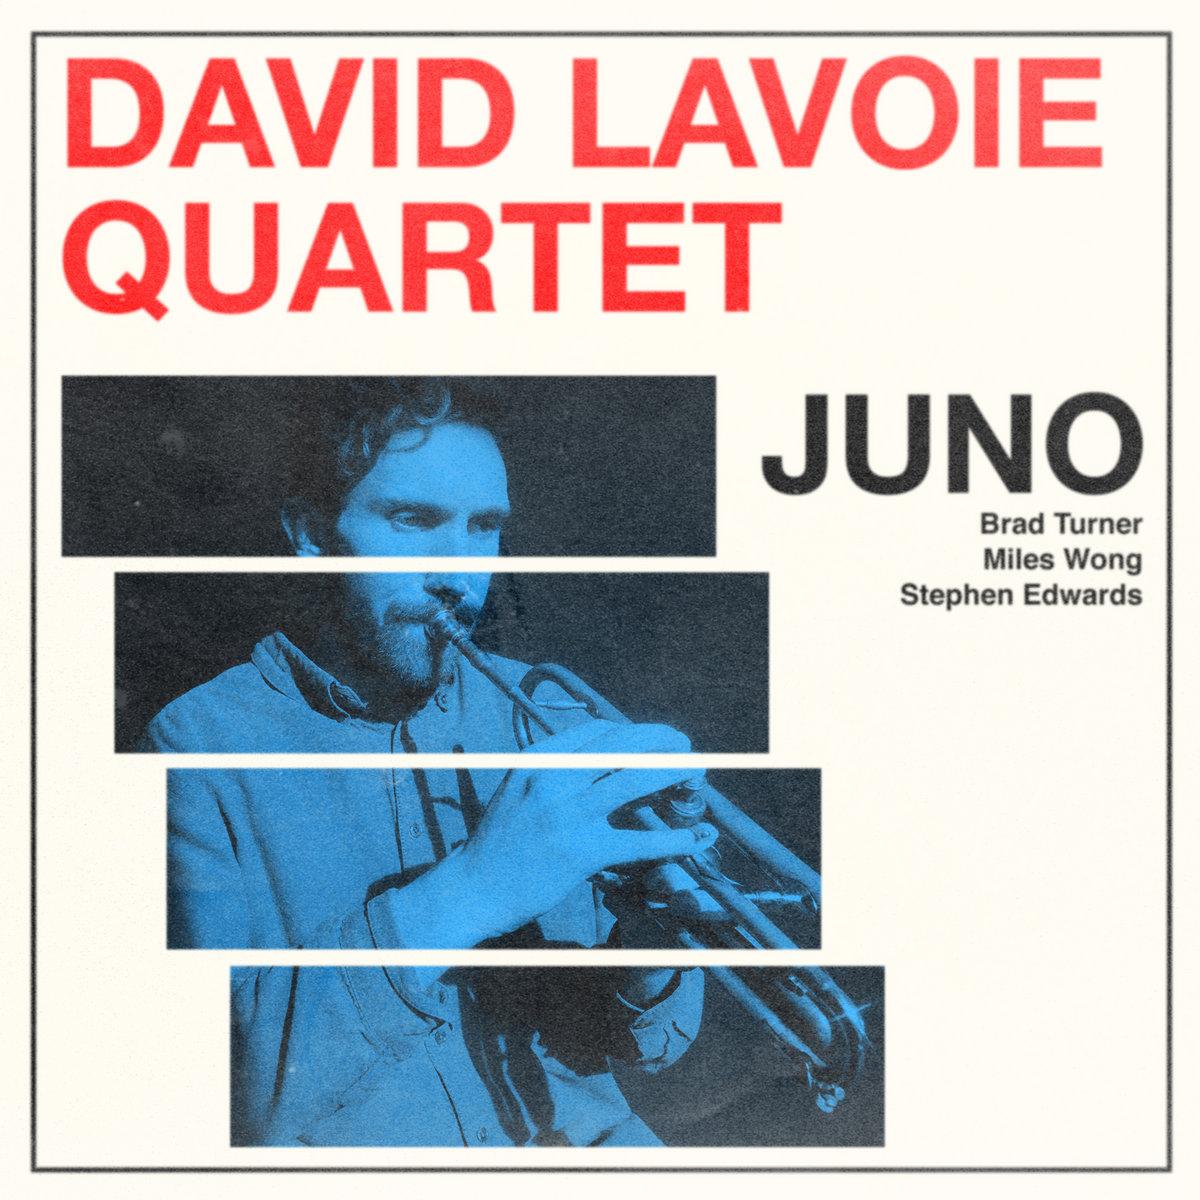 David-Lavoie-Quartet-–-Juno David Lavoie Quartet – Juno (2020)